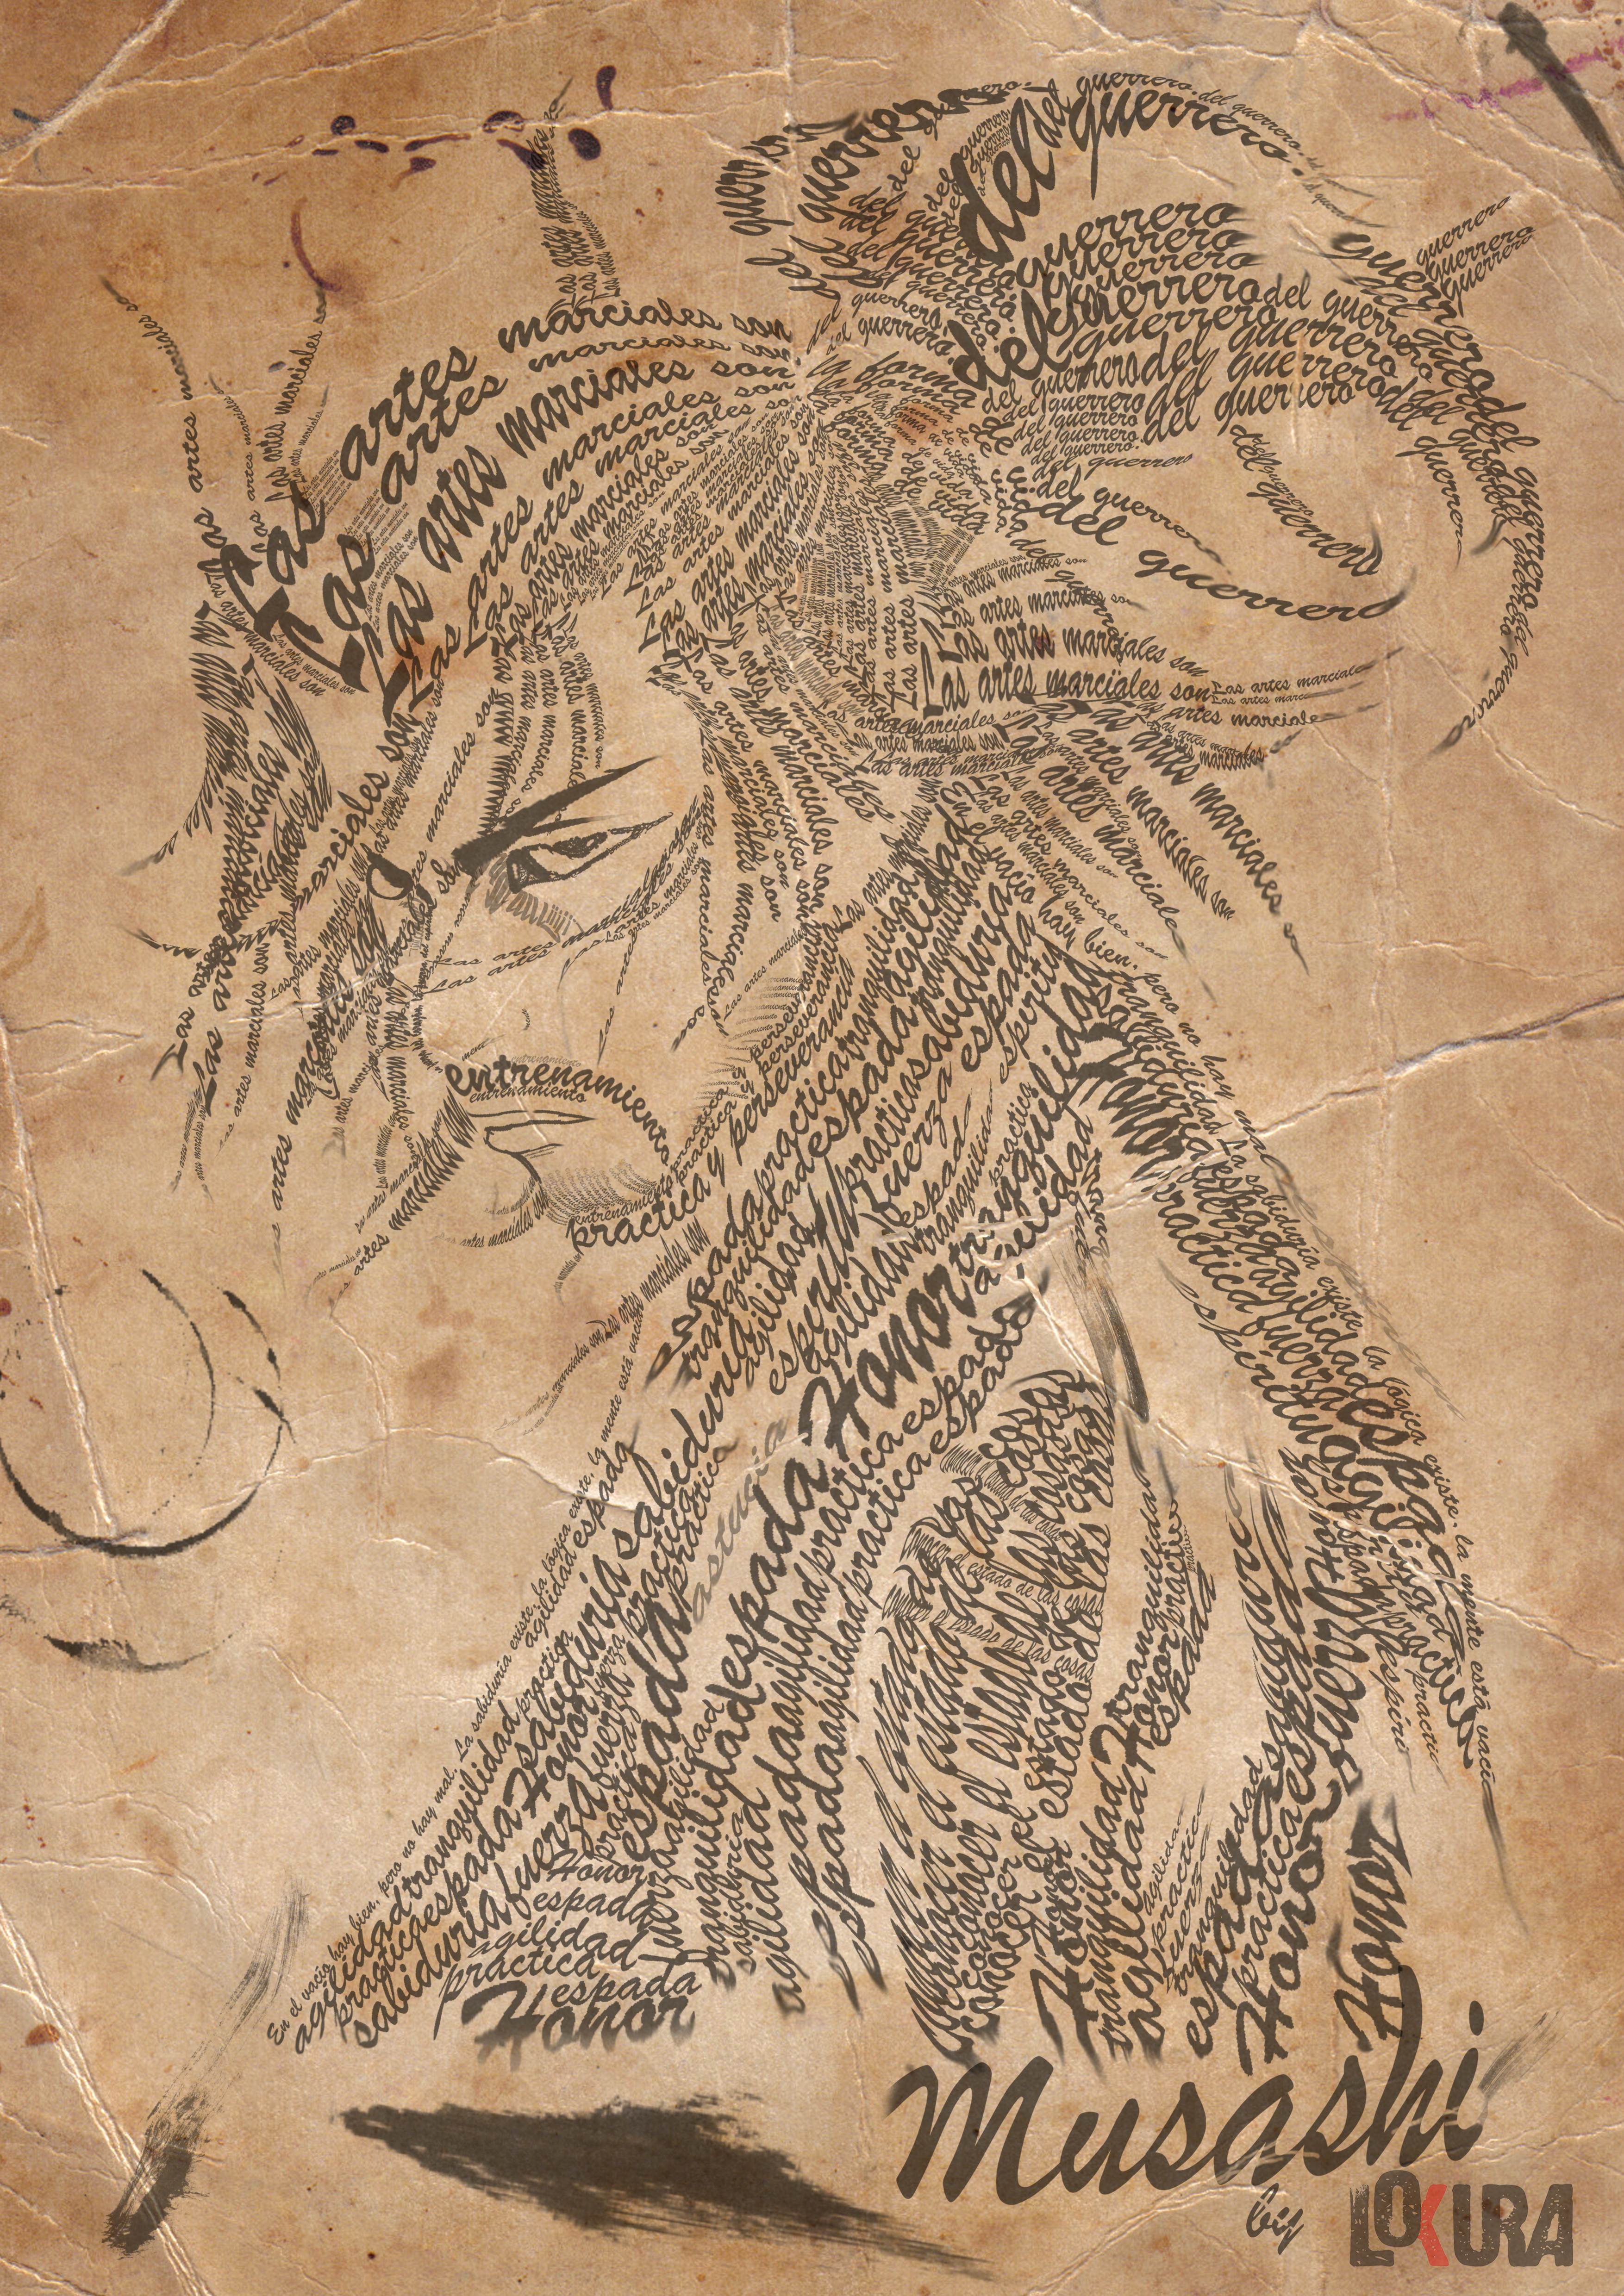 Caligrama Musashi by 666Lokura